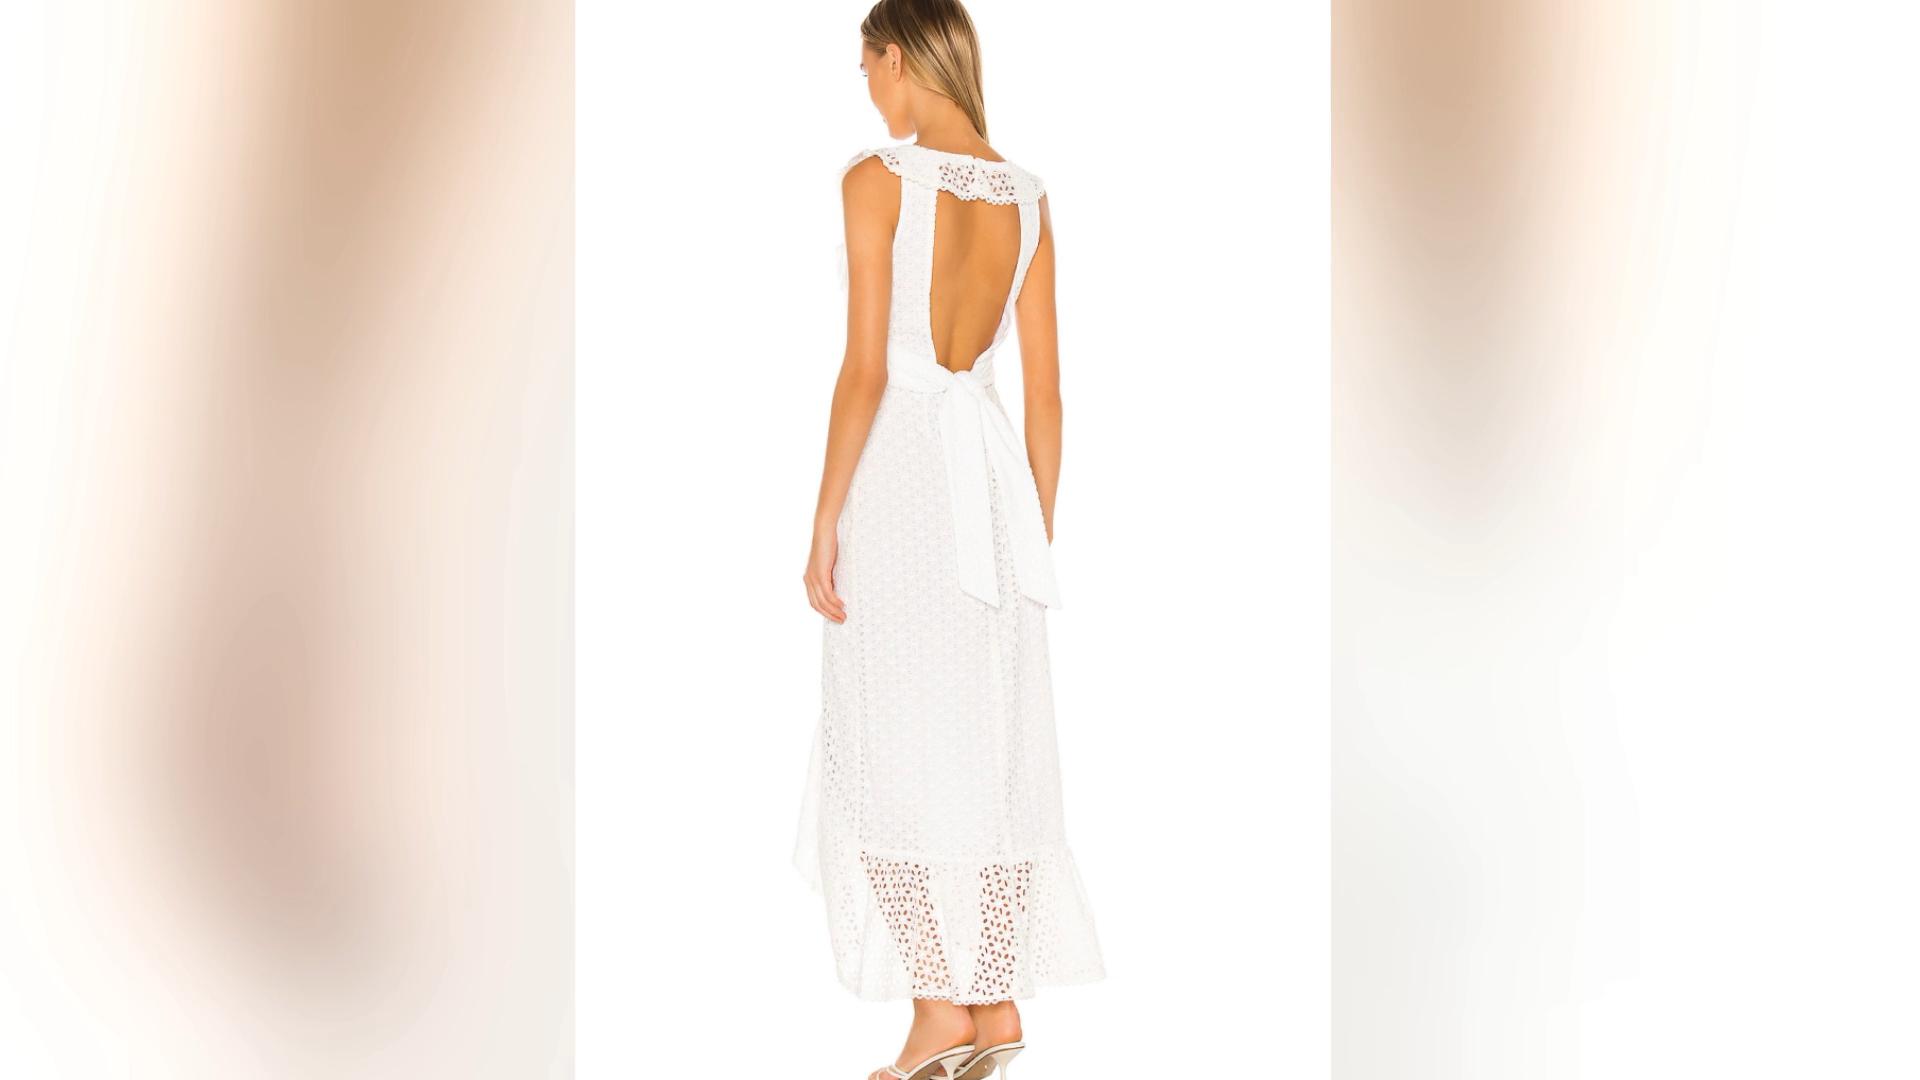 2021 OEM summer custom casual clothes cotton Eyelet fabric backless ruffles boho split maxi dress for women